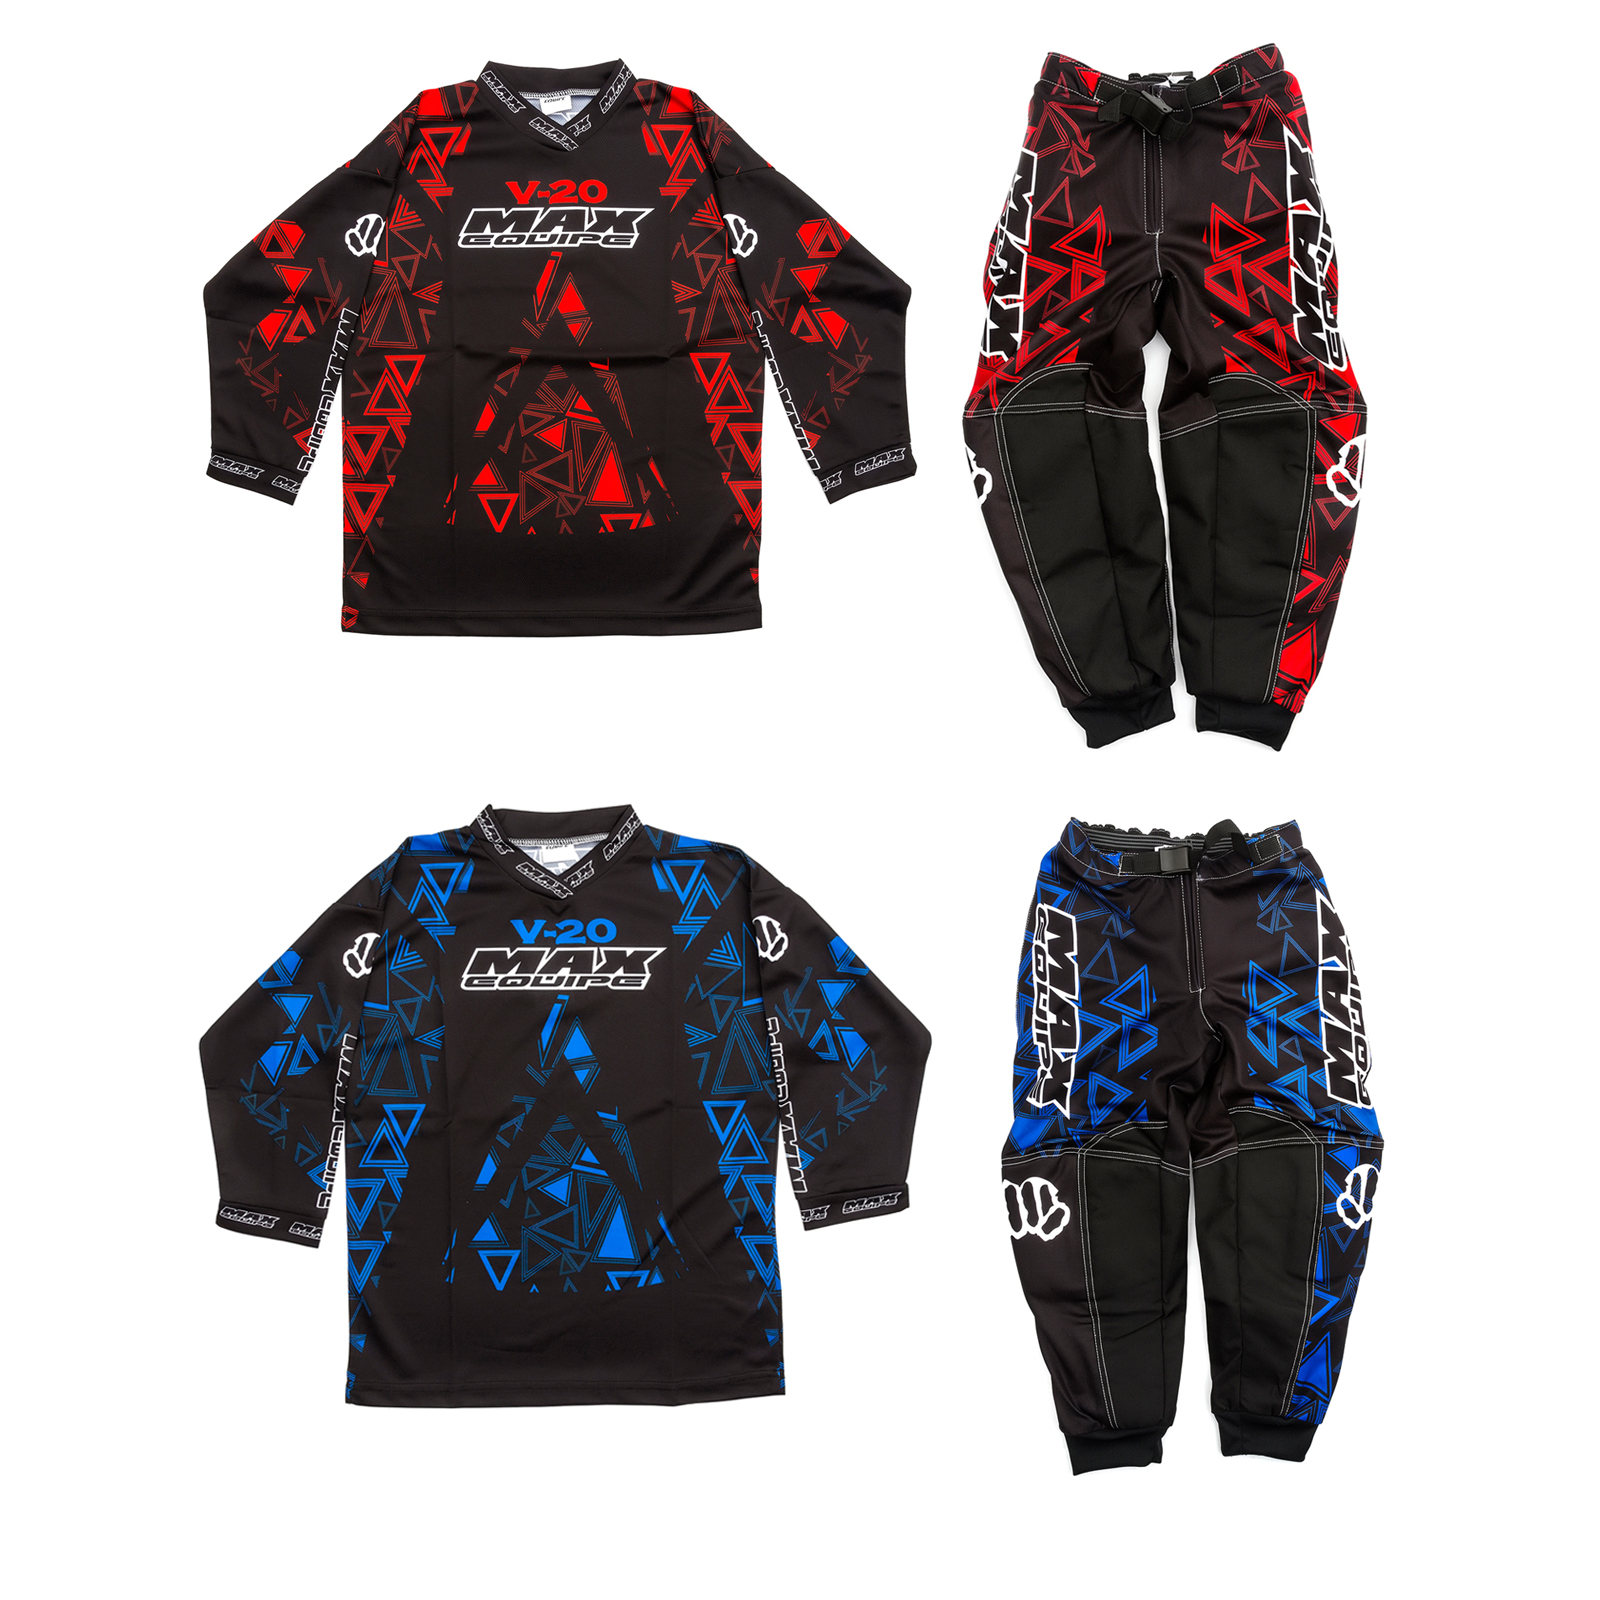 Red 22 Wulfsport Max Equipe Kids V-20 Motocross Motorbike Race Pants Trousers